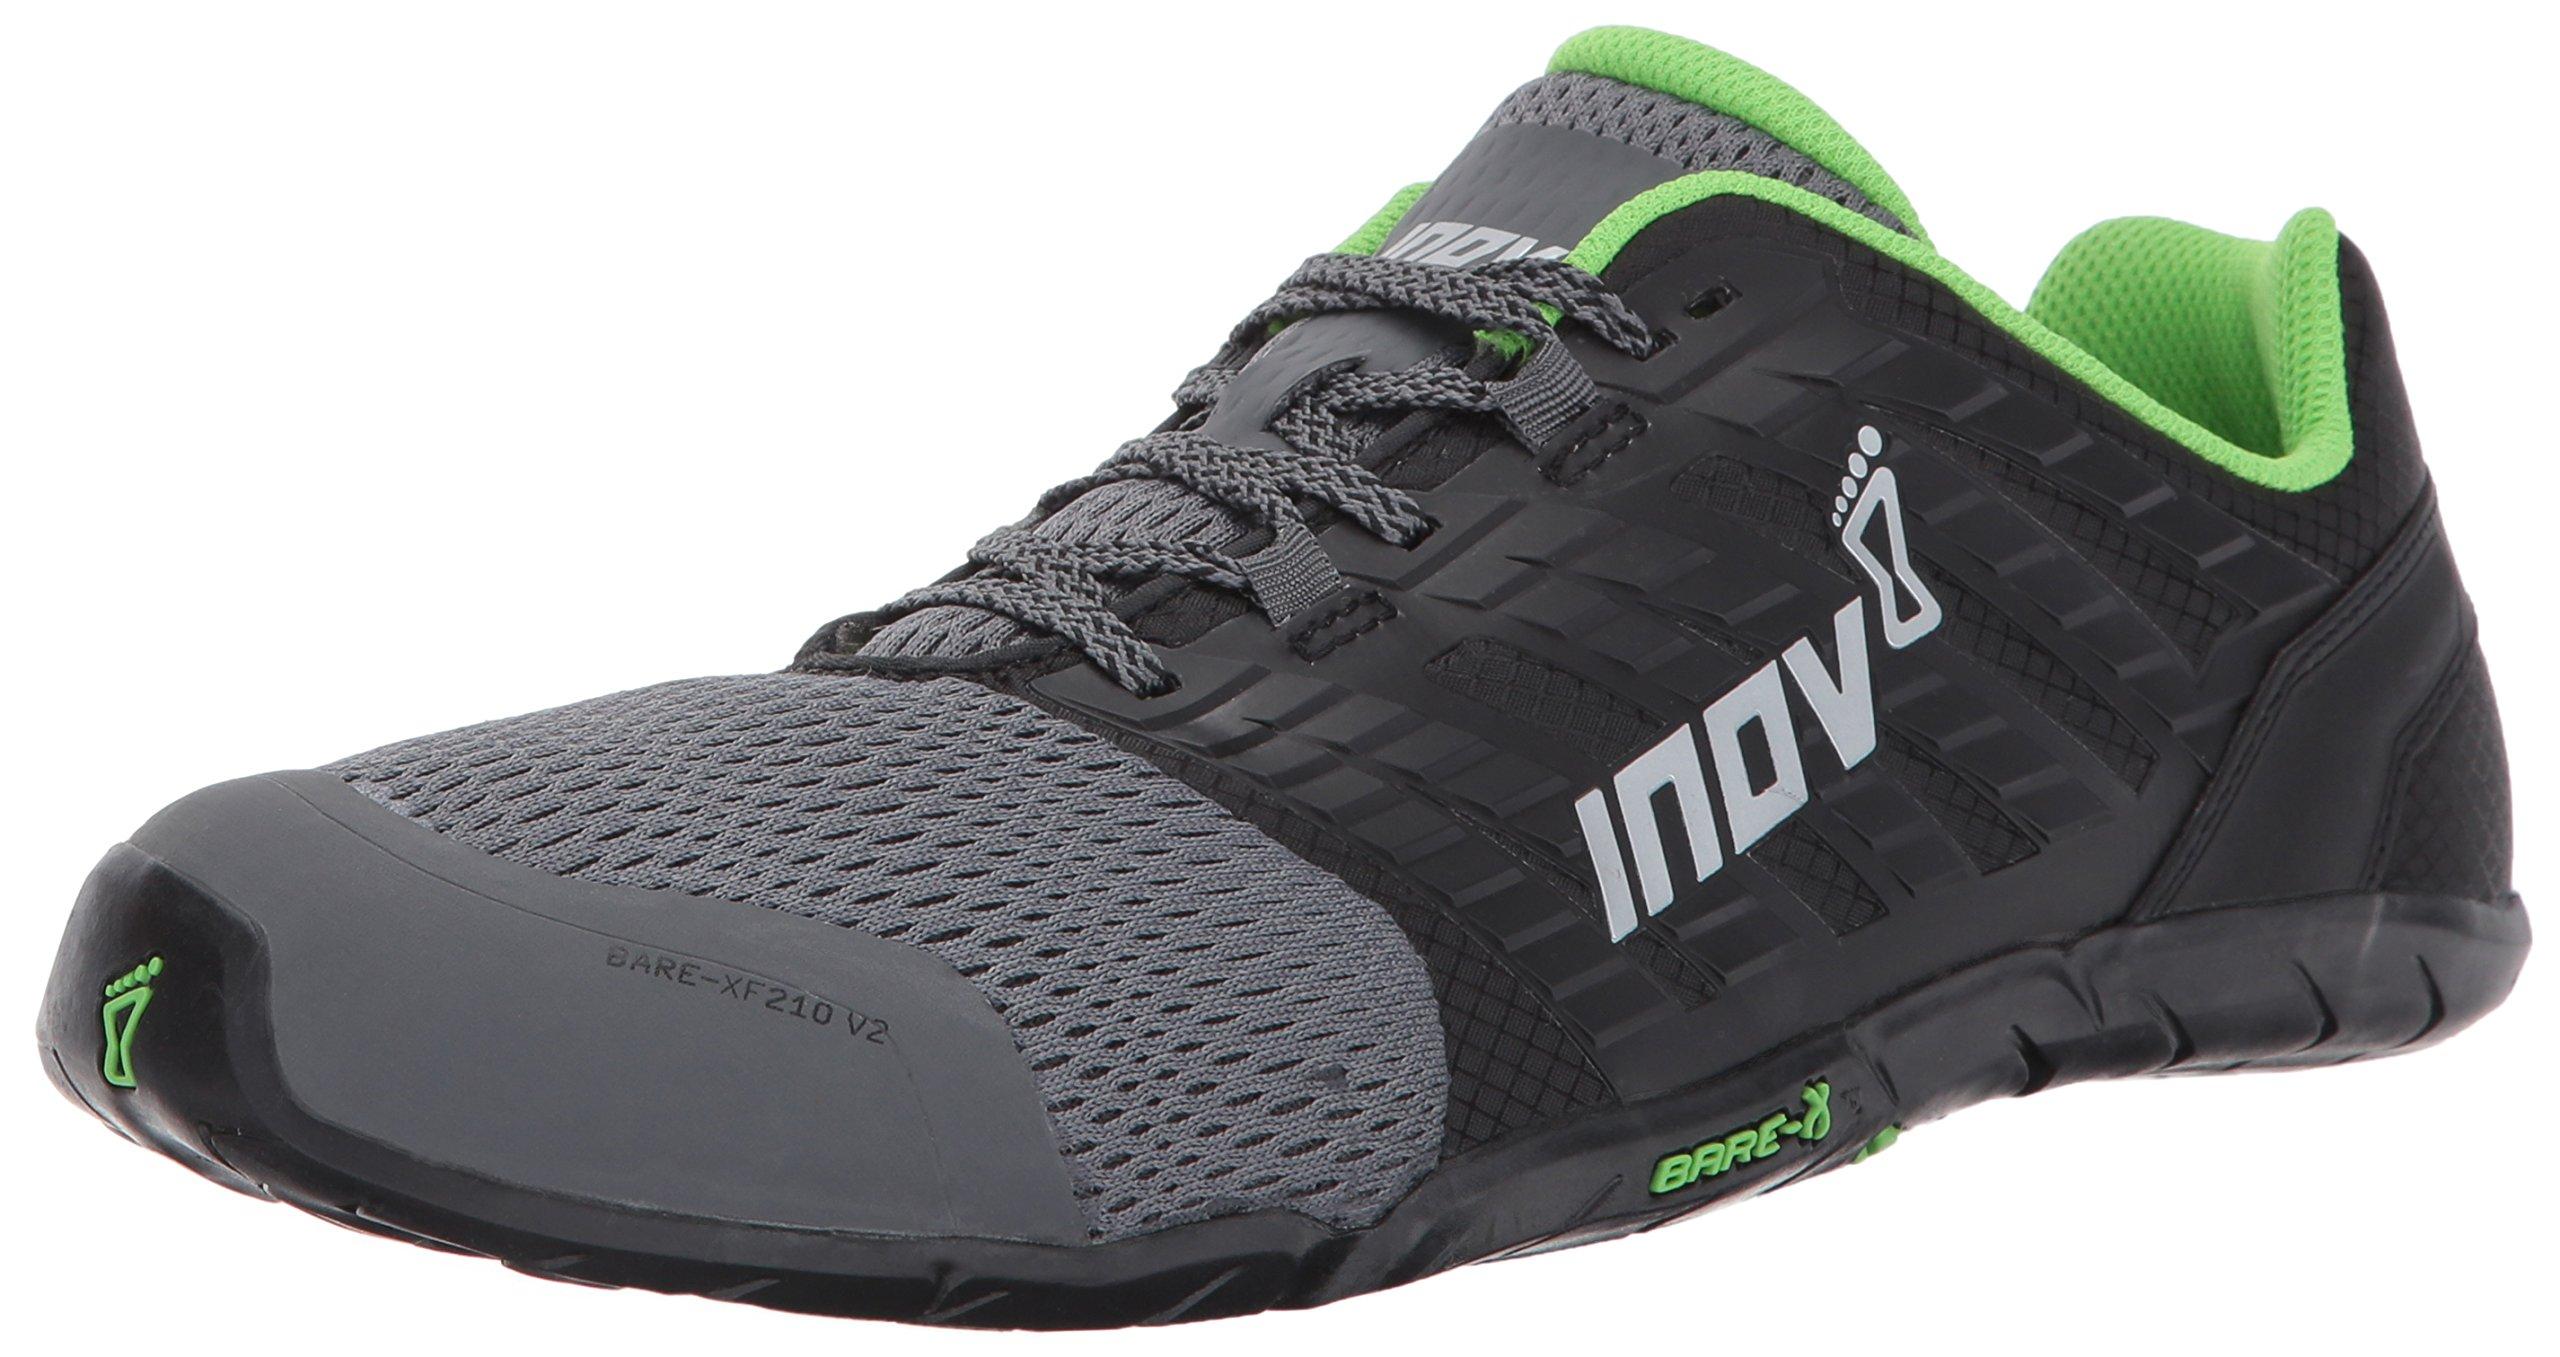 Inov-8 Men's Bare-XF 210 v2 (M) Cross Trainer, Grey/Black/Green, 10.5 D US